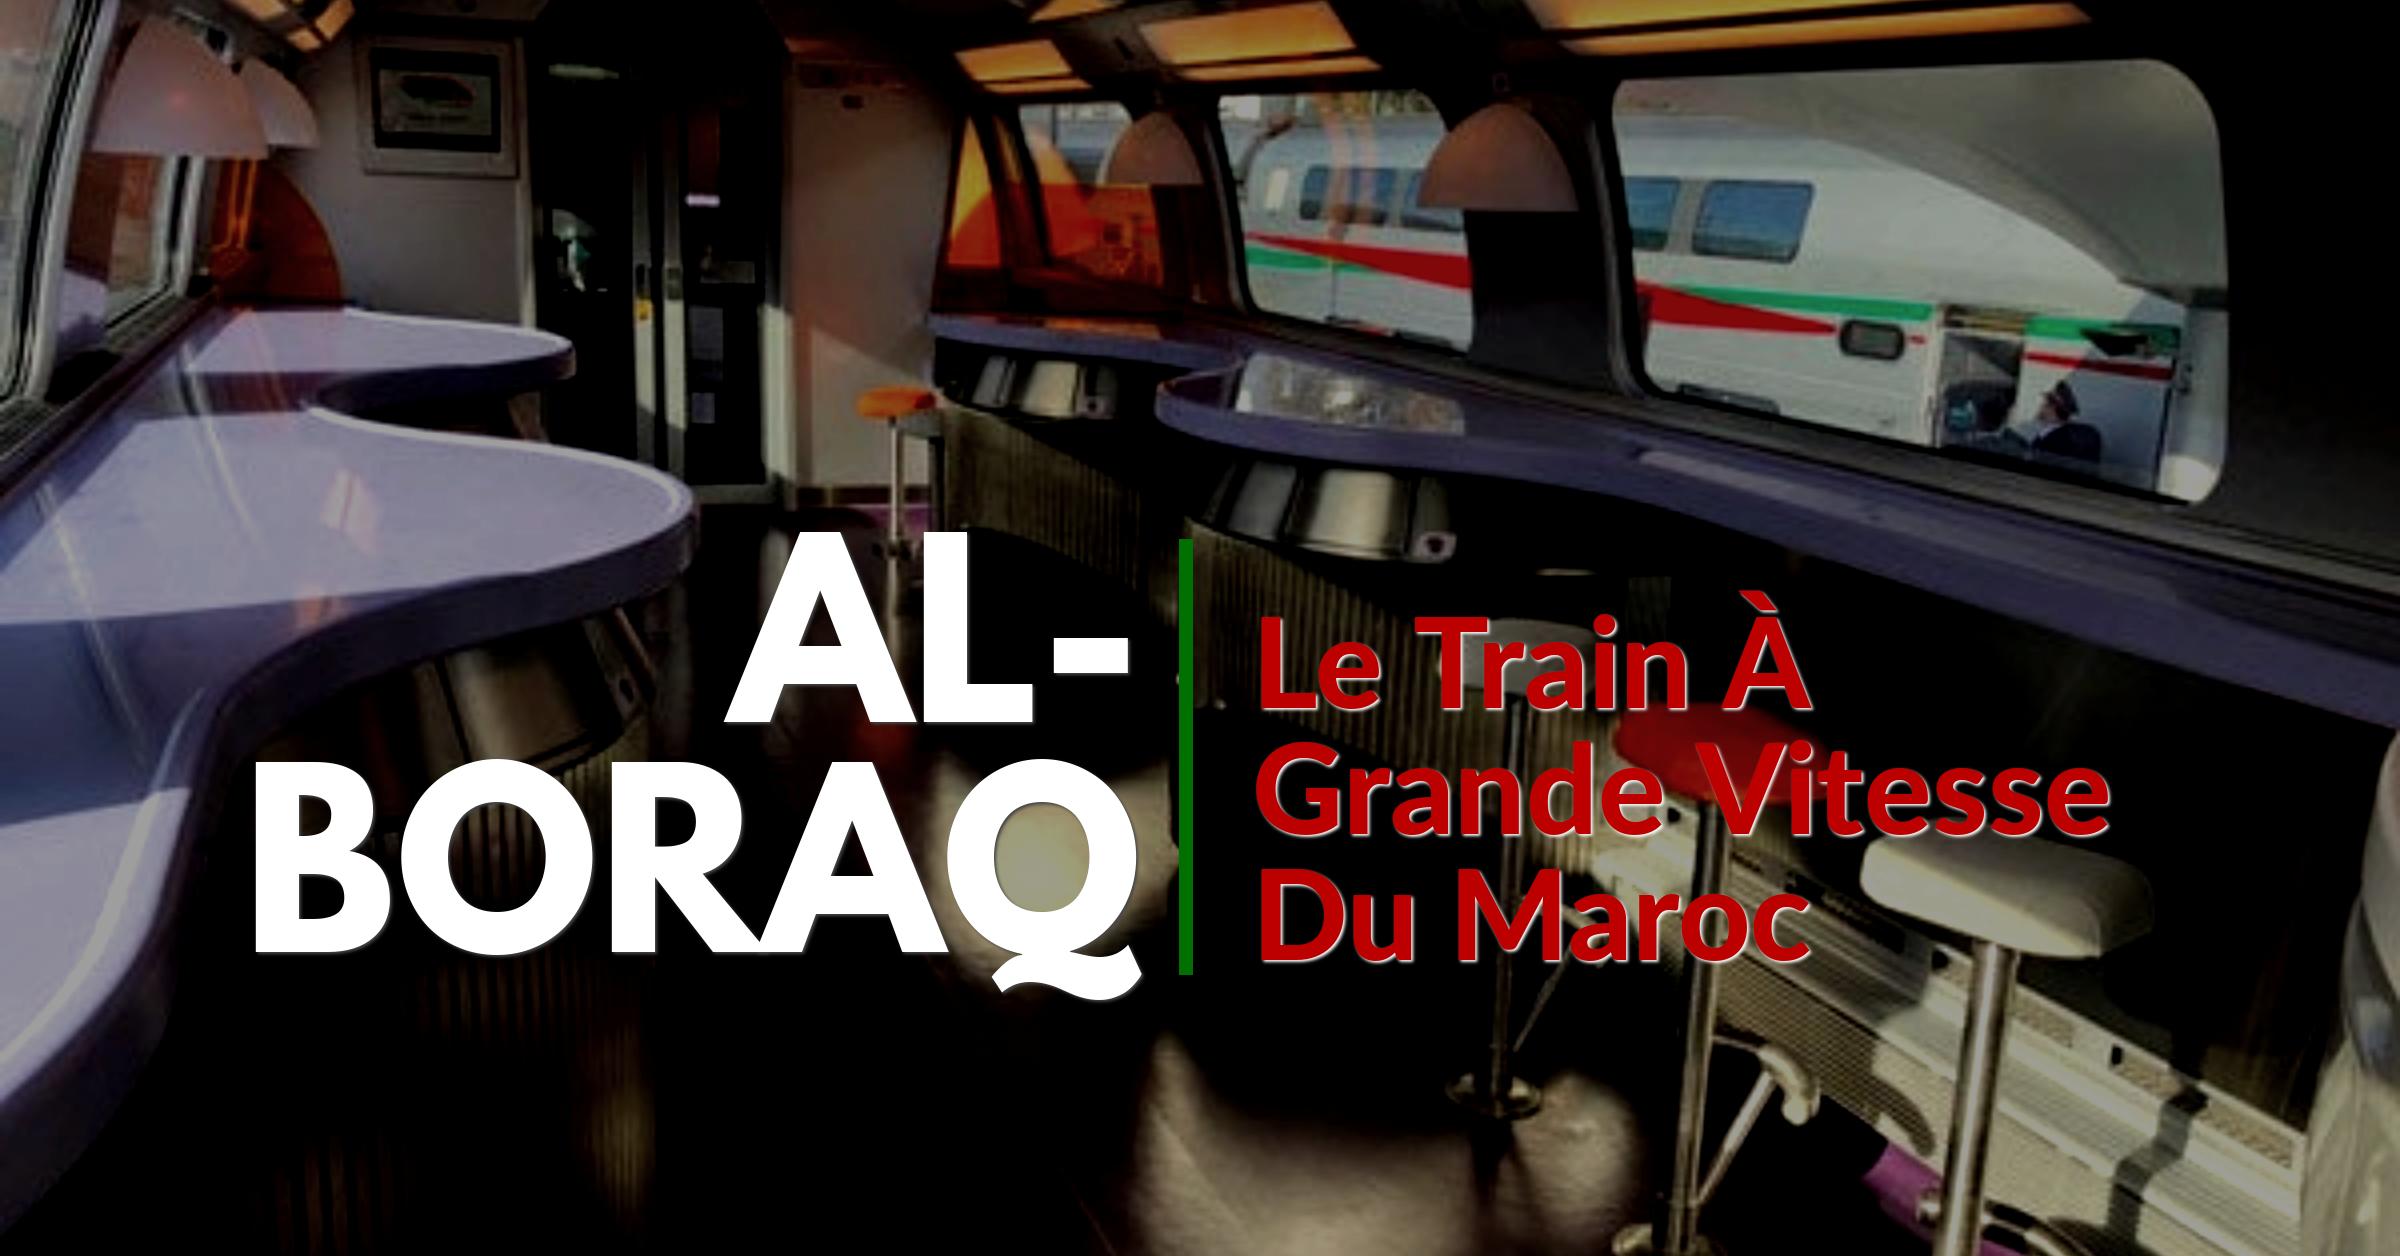 Le train à grande vitesse du Maroc